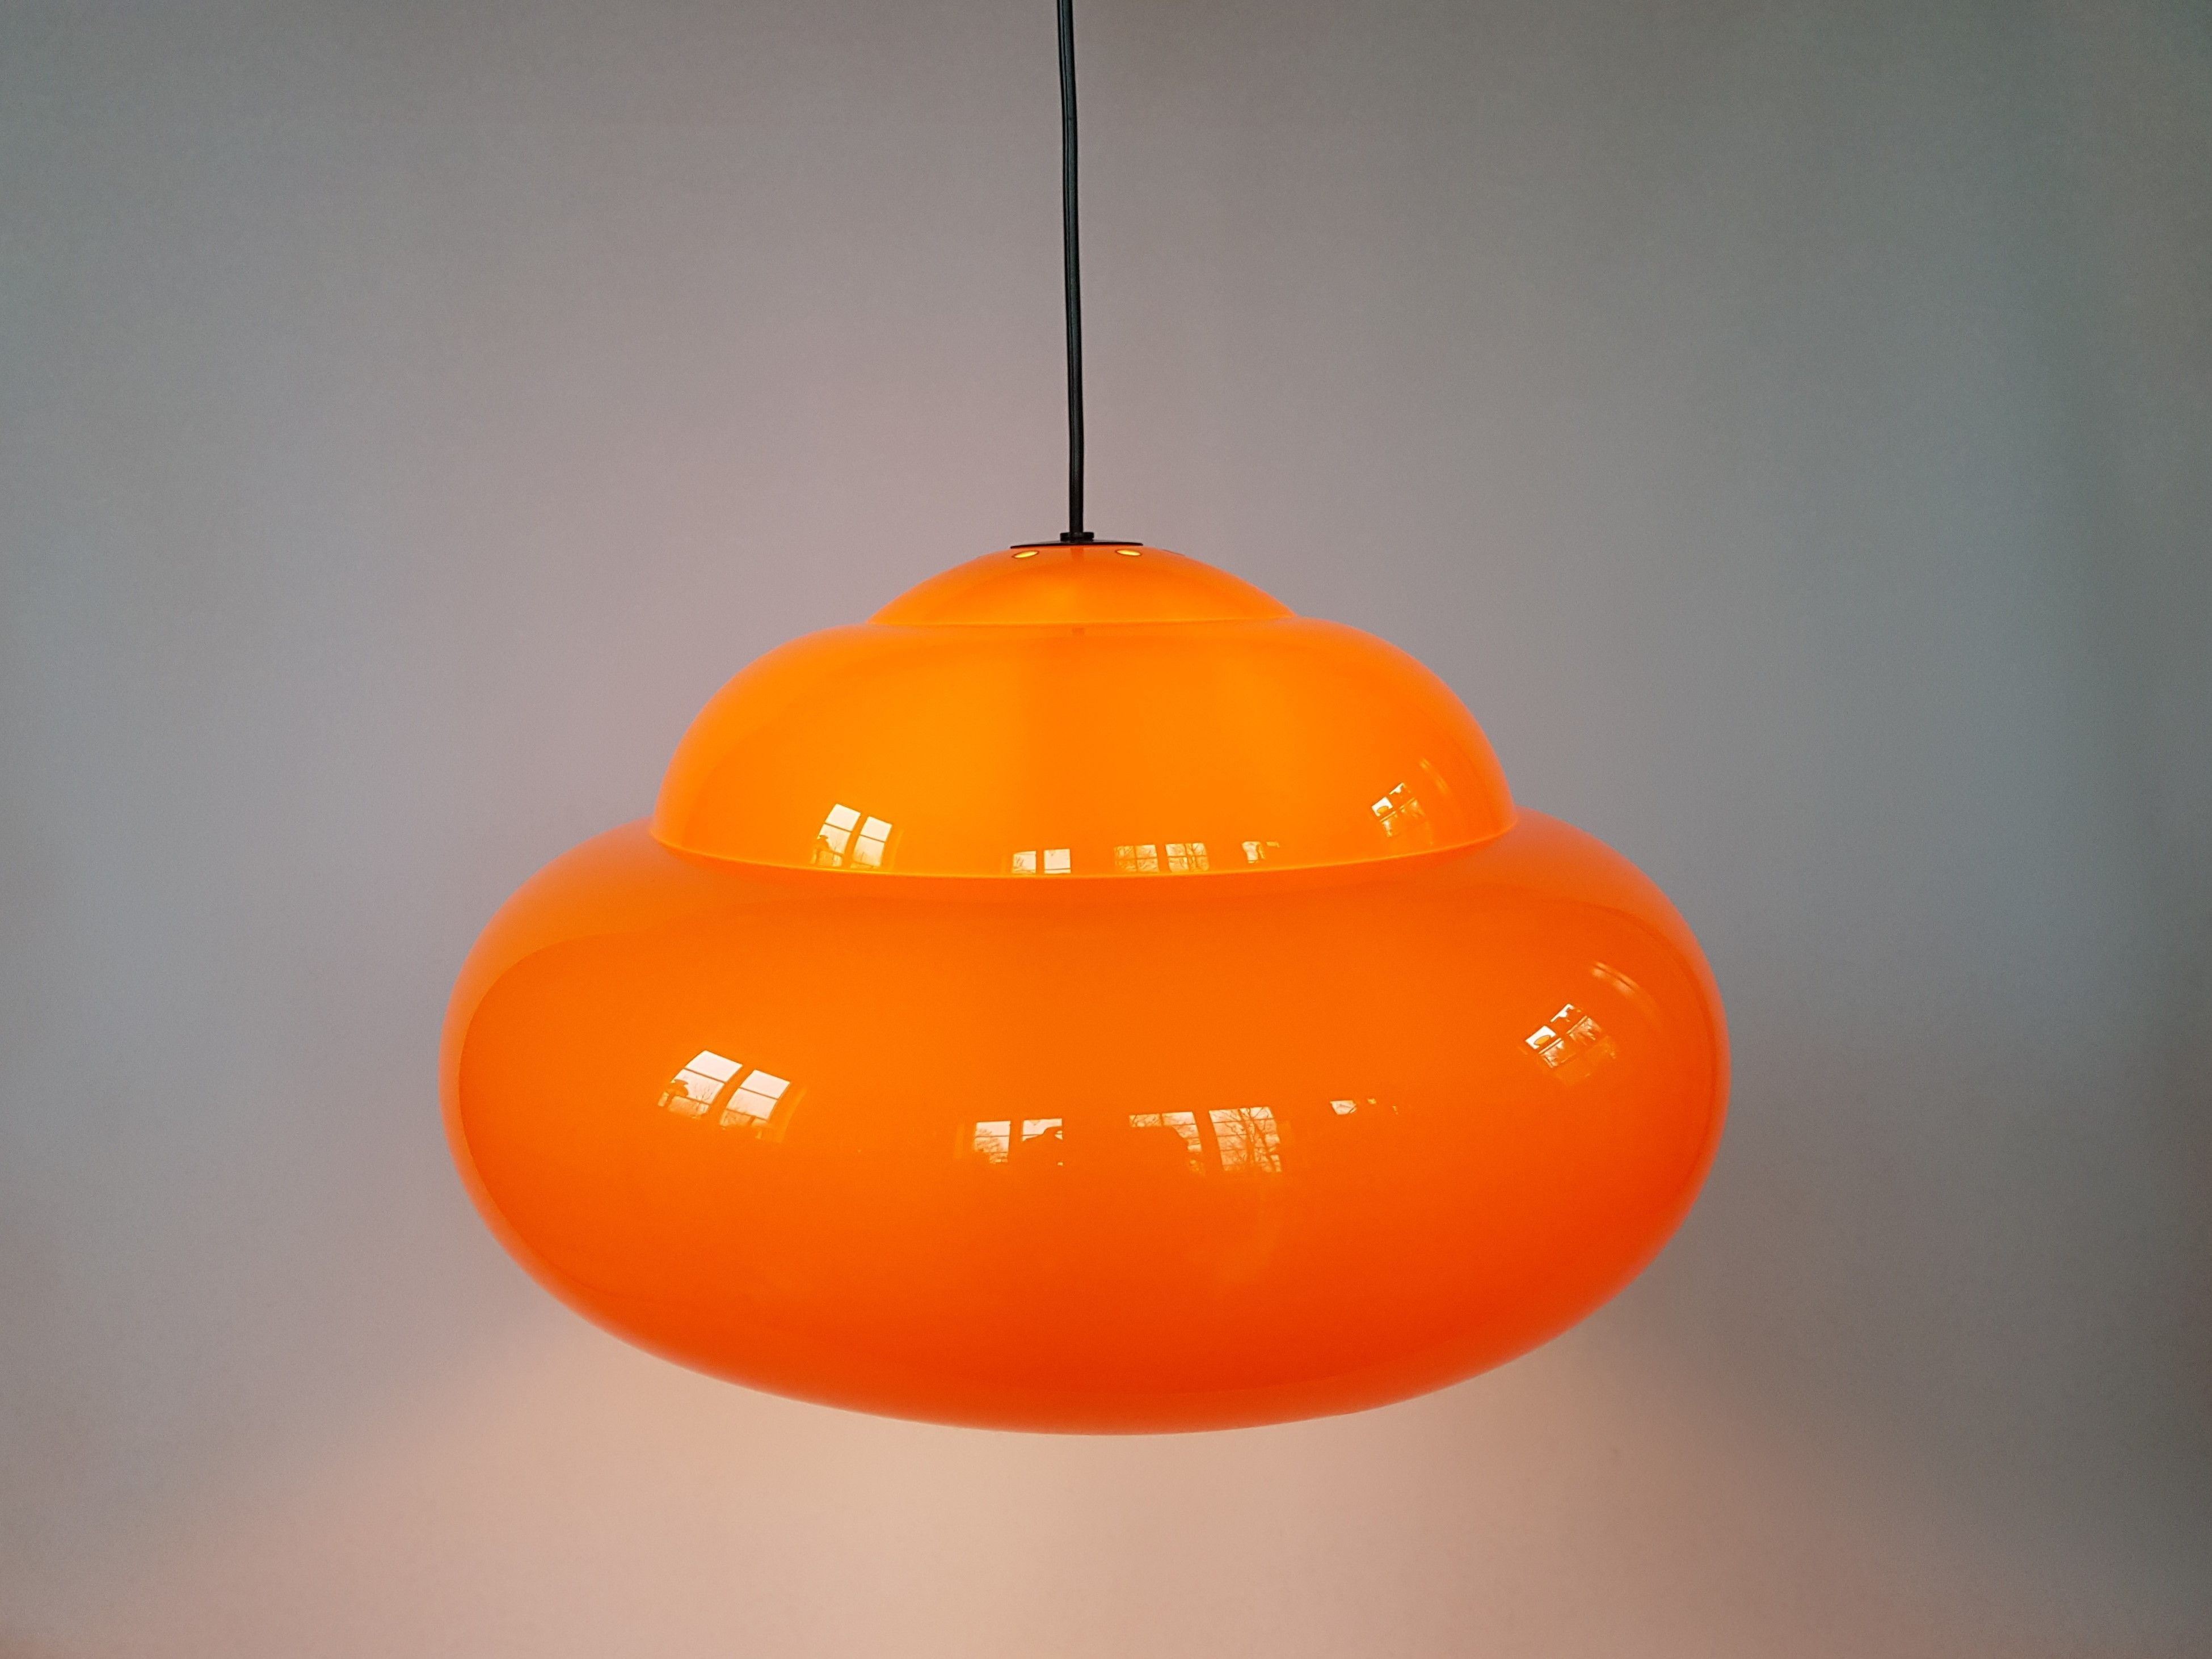 Amazing Vintage Orange Space Age Pendant Lamp By Fagerhult Belysning 1970s Scandinavian Design Swedish Design Atomic Age In 2020 Diy Pendant Light Lamp Pendant Lamp